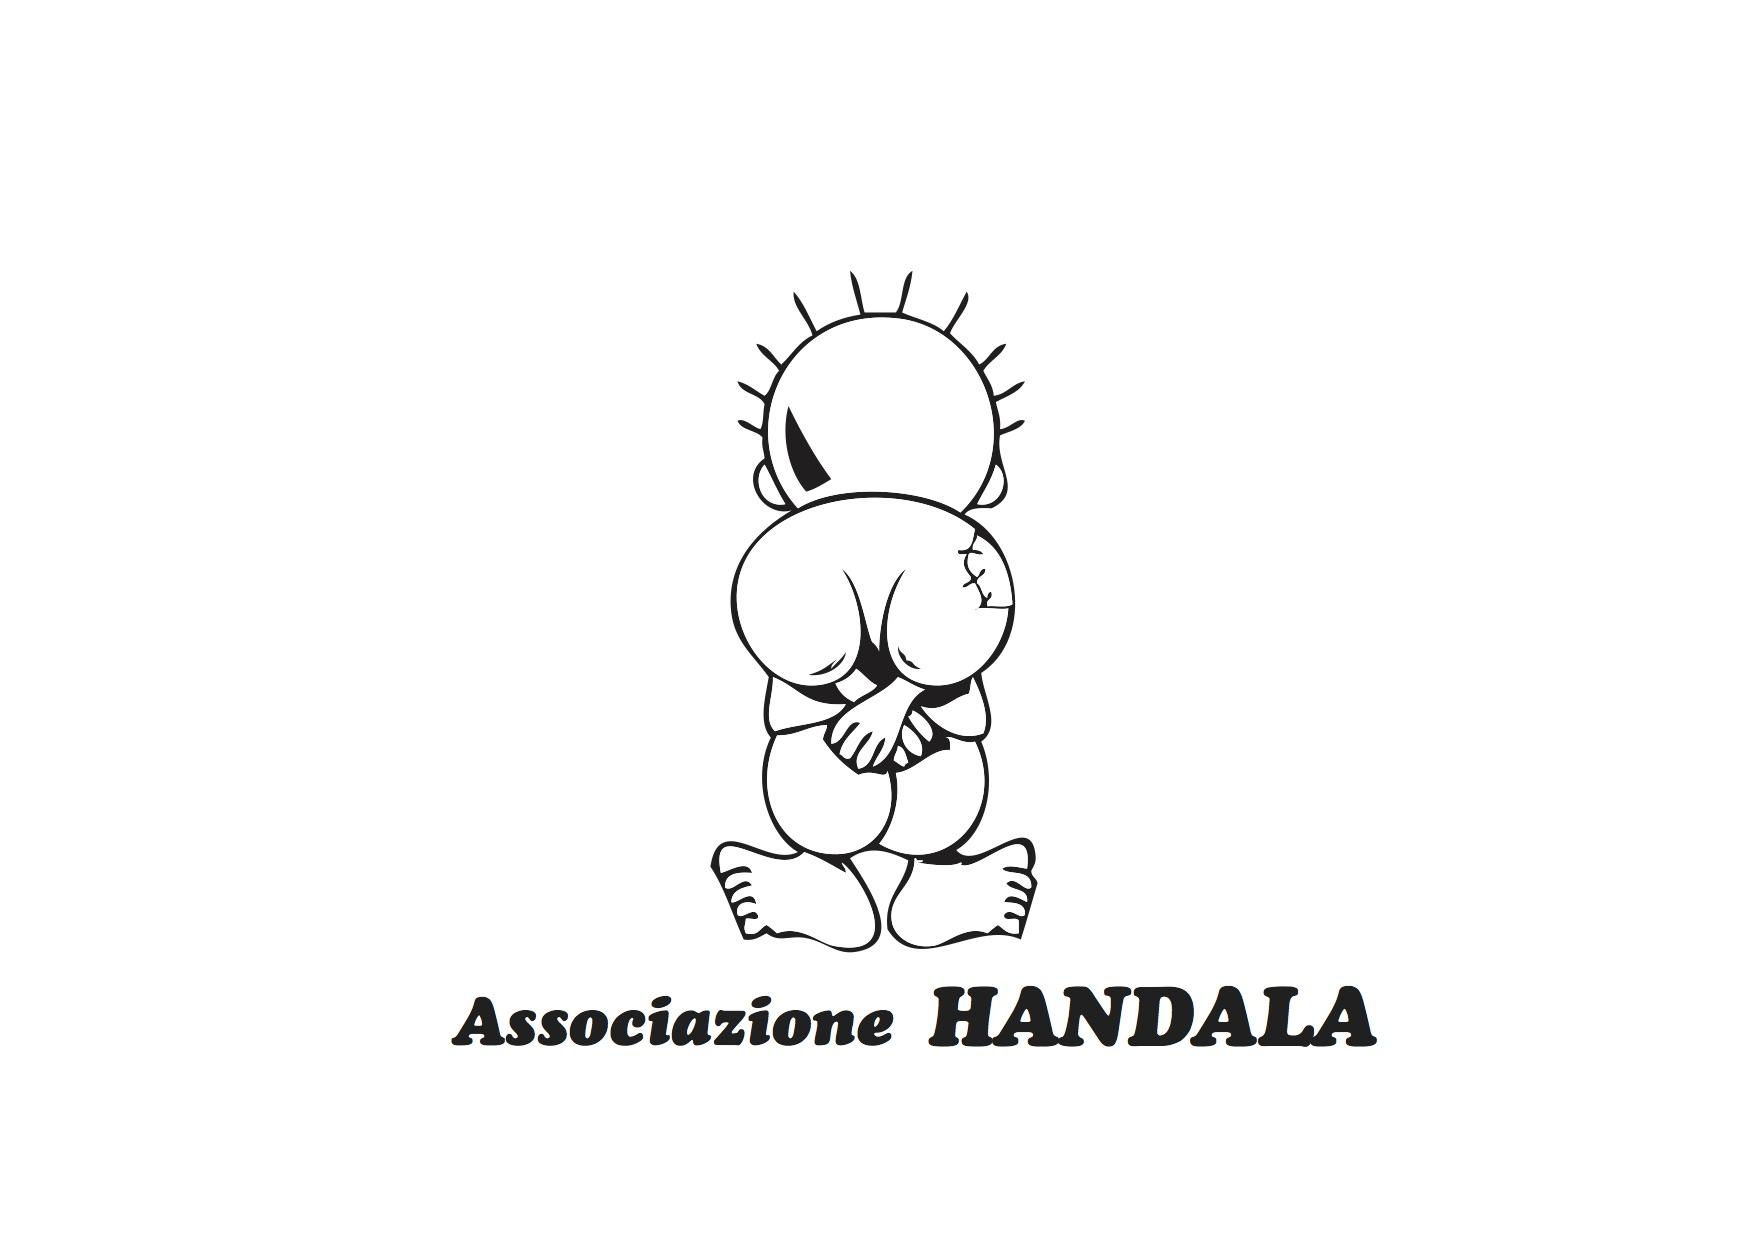 Handala-1